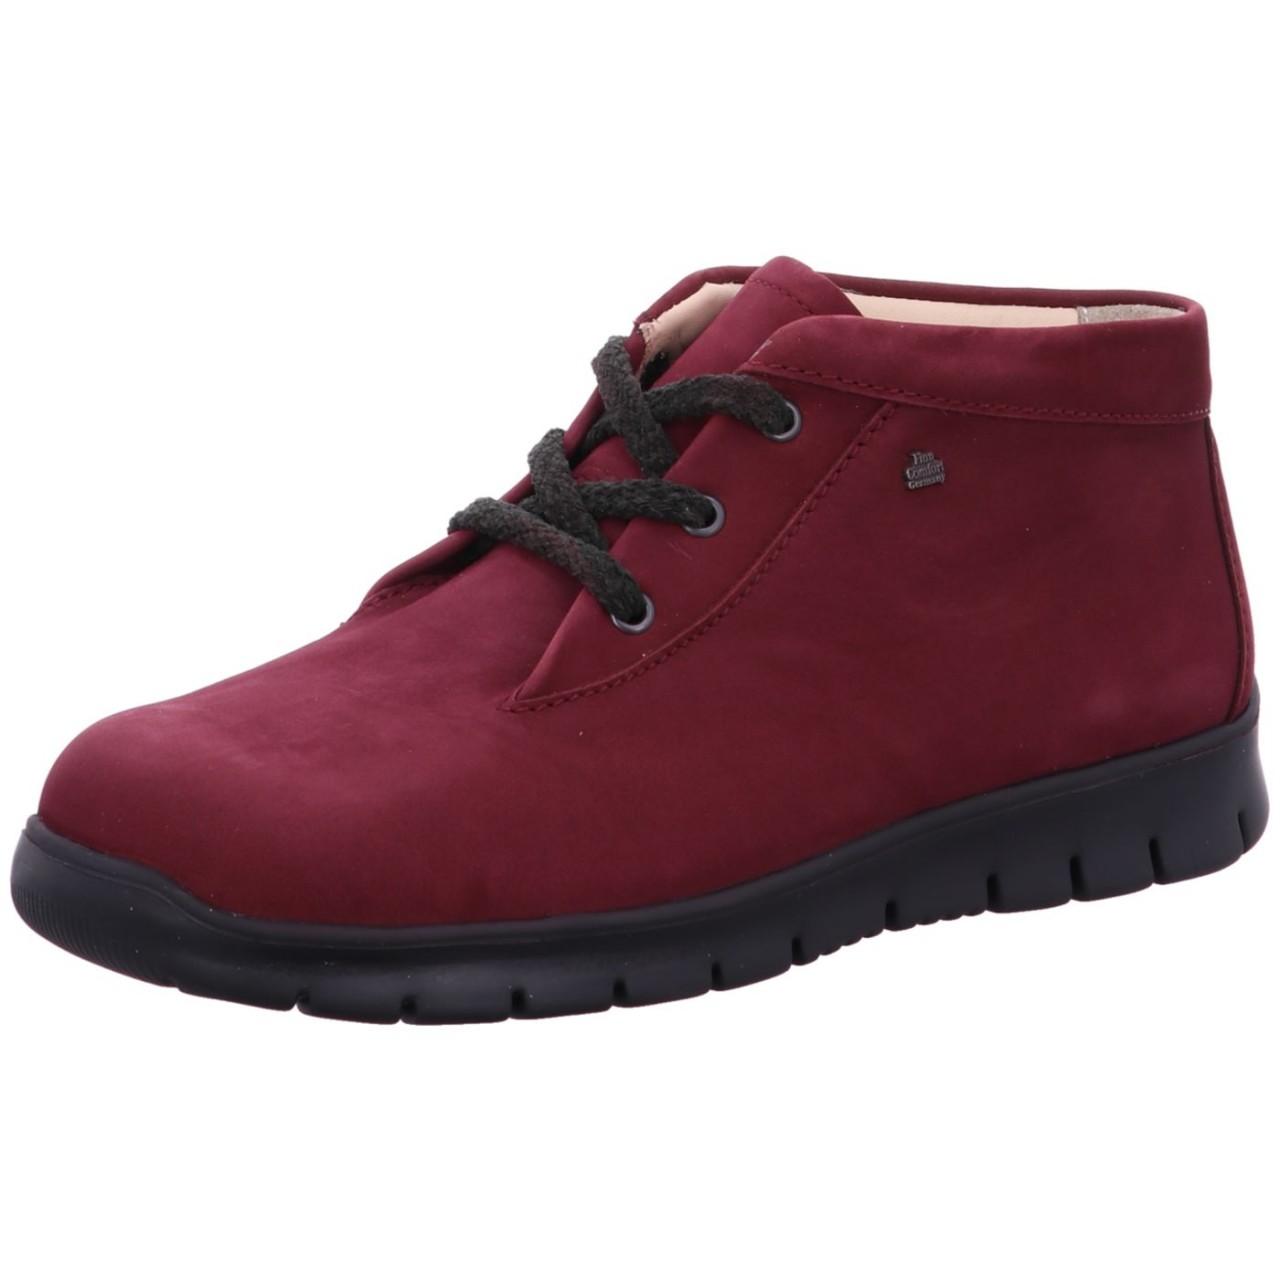 FinnComfort Boot Leon FinnRelax Rot redwine 2854 373436